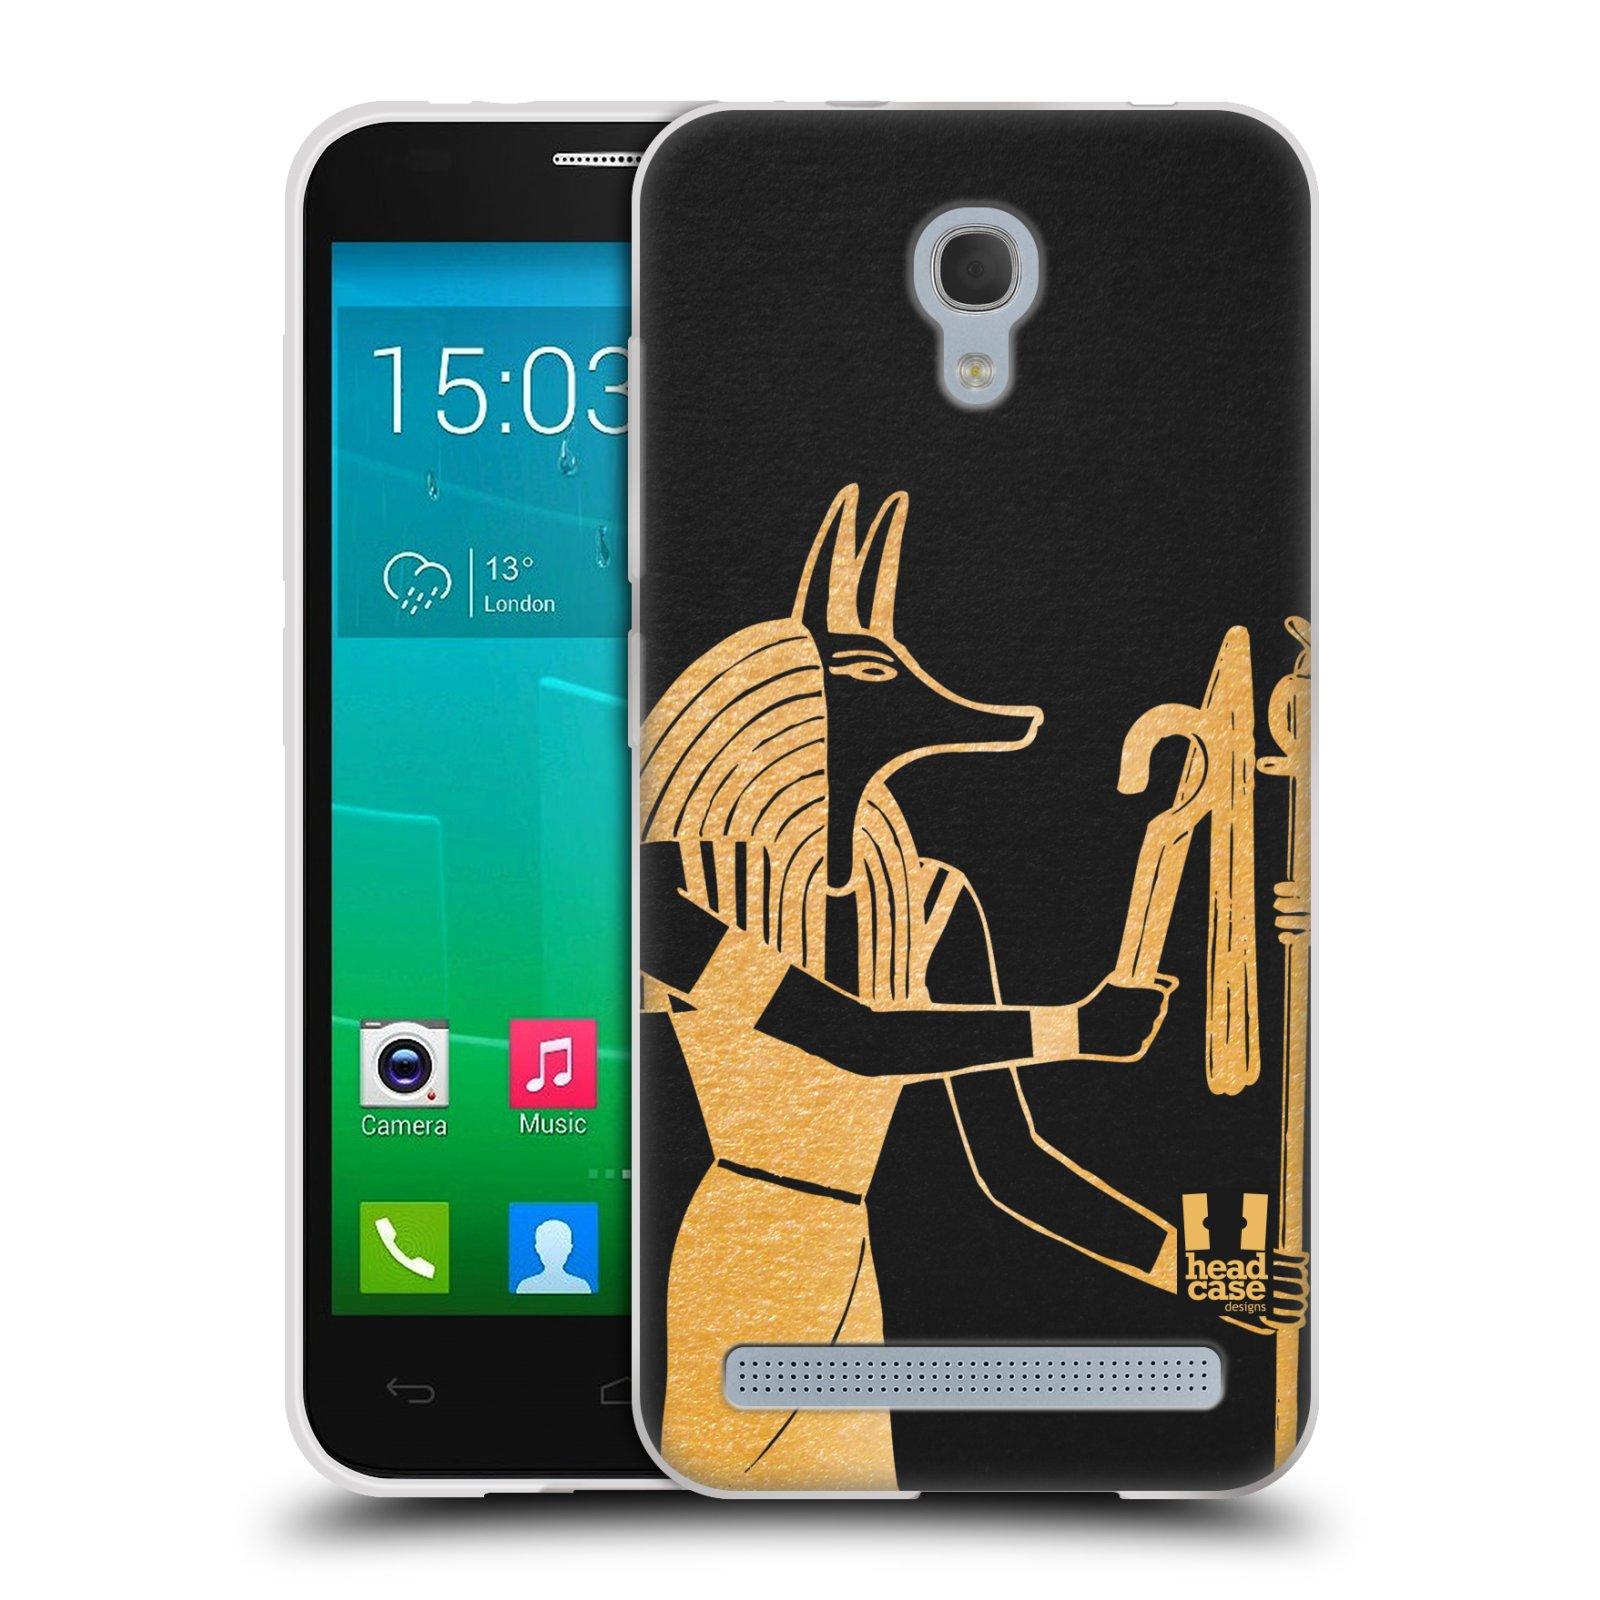 Silikonové pouzdro na mobil Alcatel One Touch Idol 2 Mini S 6036Y HEAD CASE EGYPT ANUBIS (Silikonový kryt či obal na mobilní telefon Alcatel Idol 2 Mini S OT-6036Y)